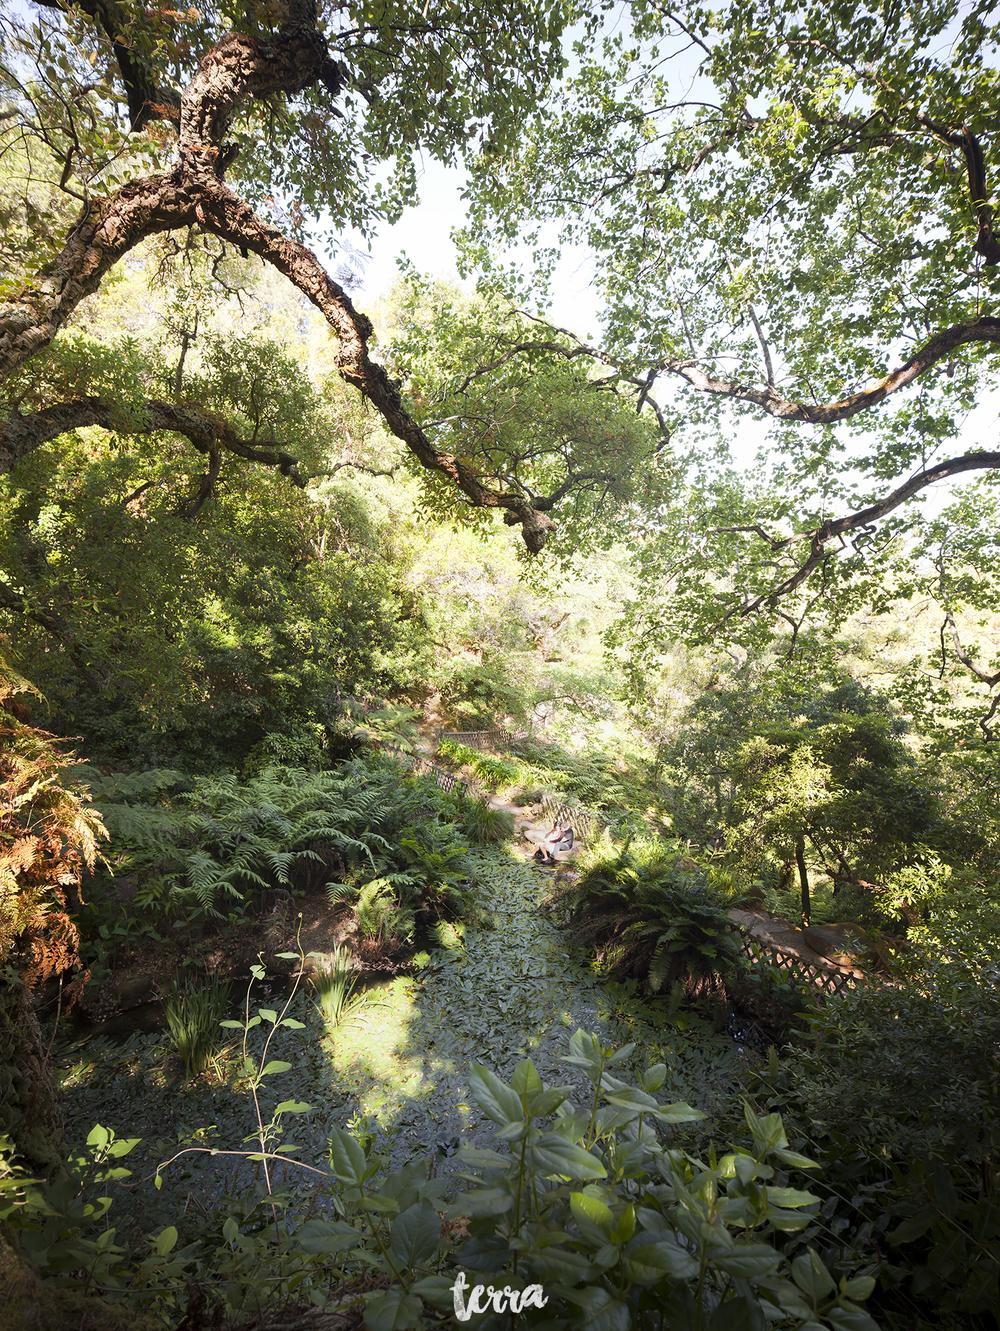 sessao-fotografica-parque-palacio-monserrate-sintra-terra-fotografia-0010.jpg